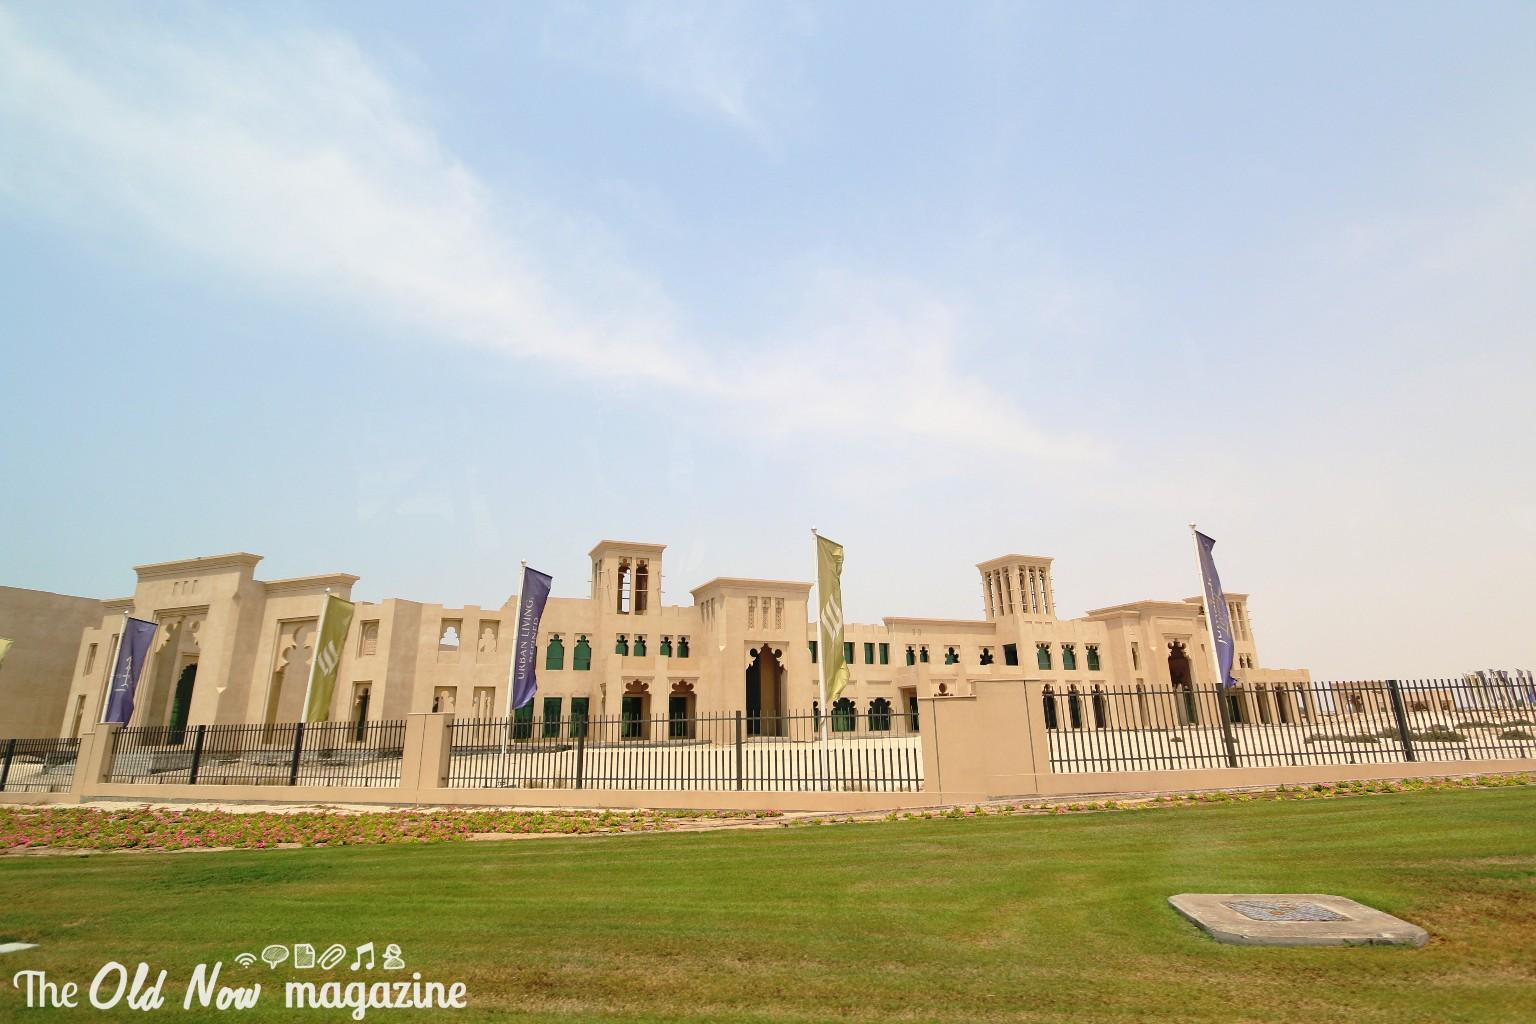 DUBAY DAY2 THEOLDNOW (10)